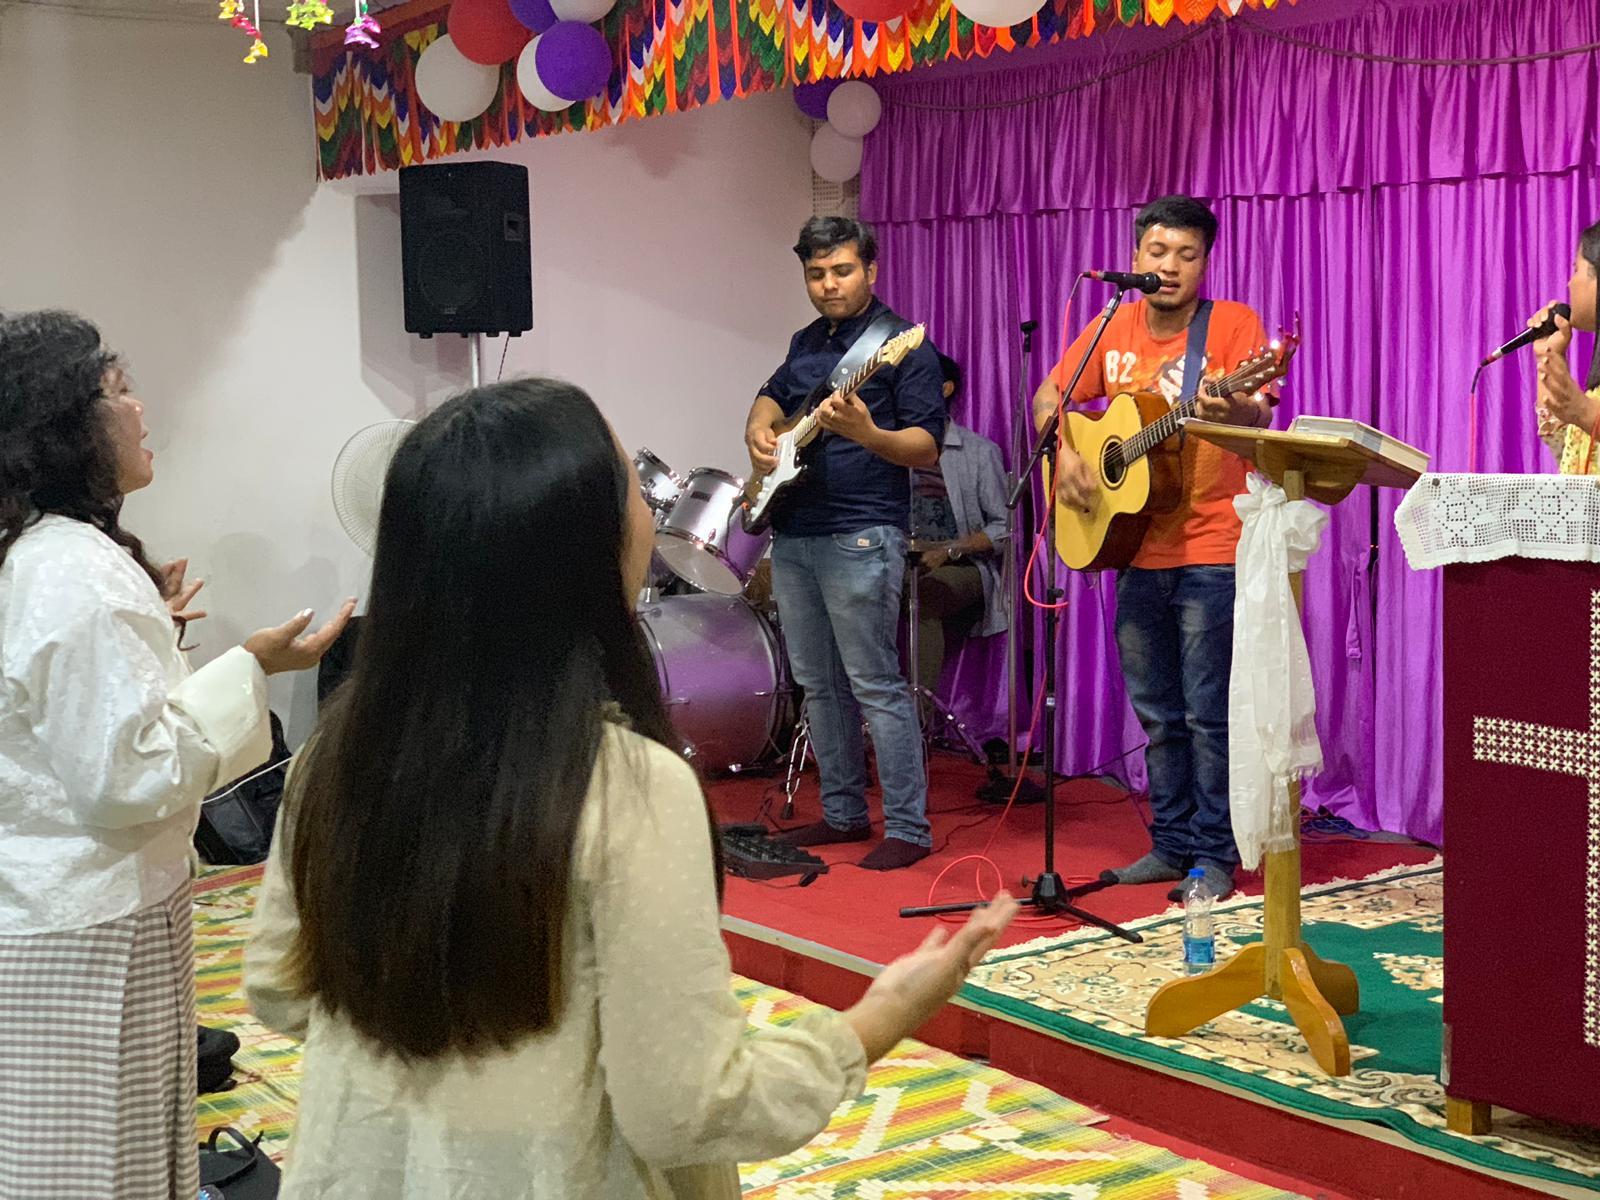 bhutan-nextgen-worship.JPG